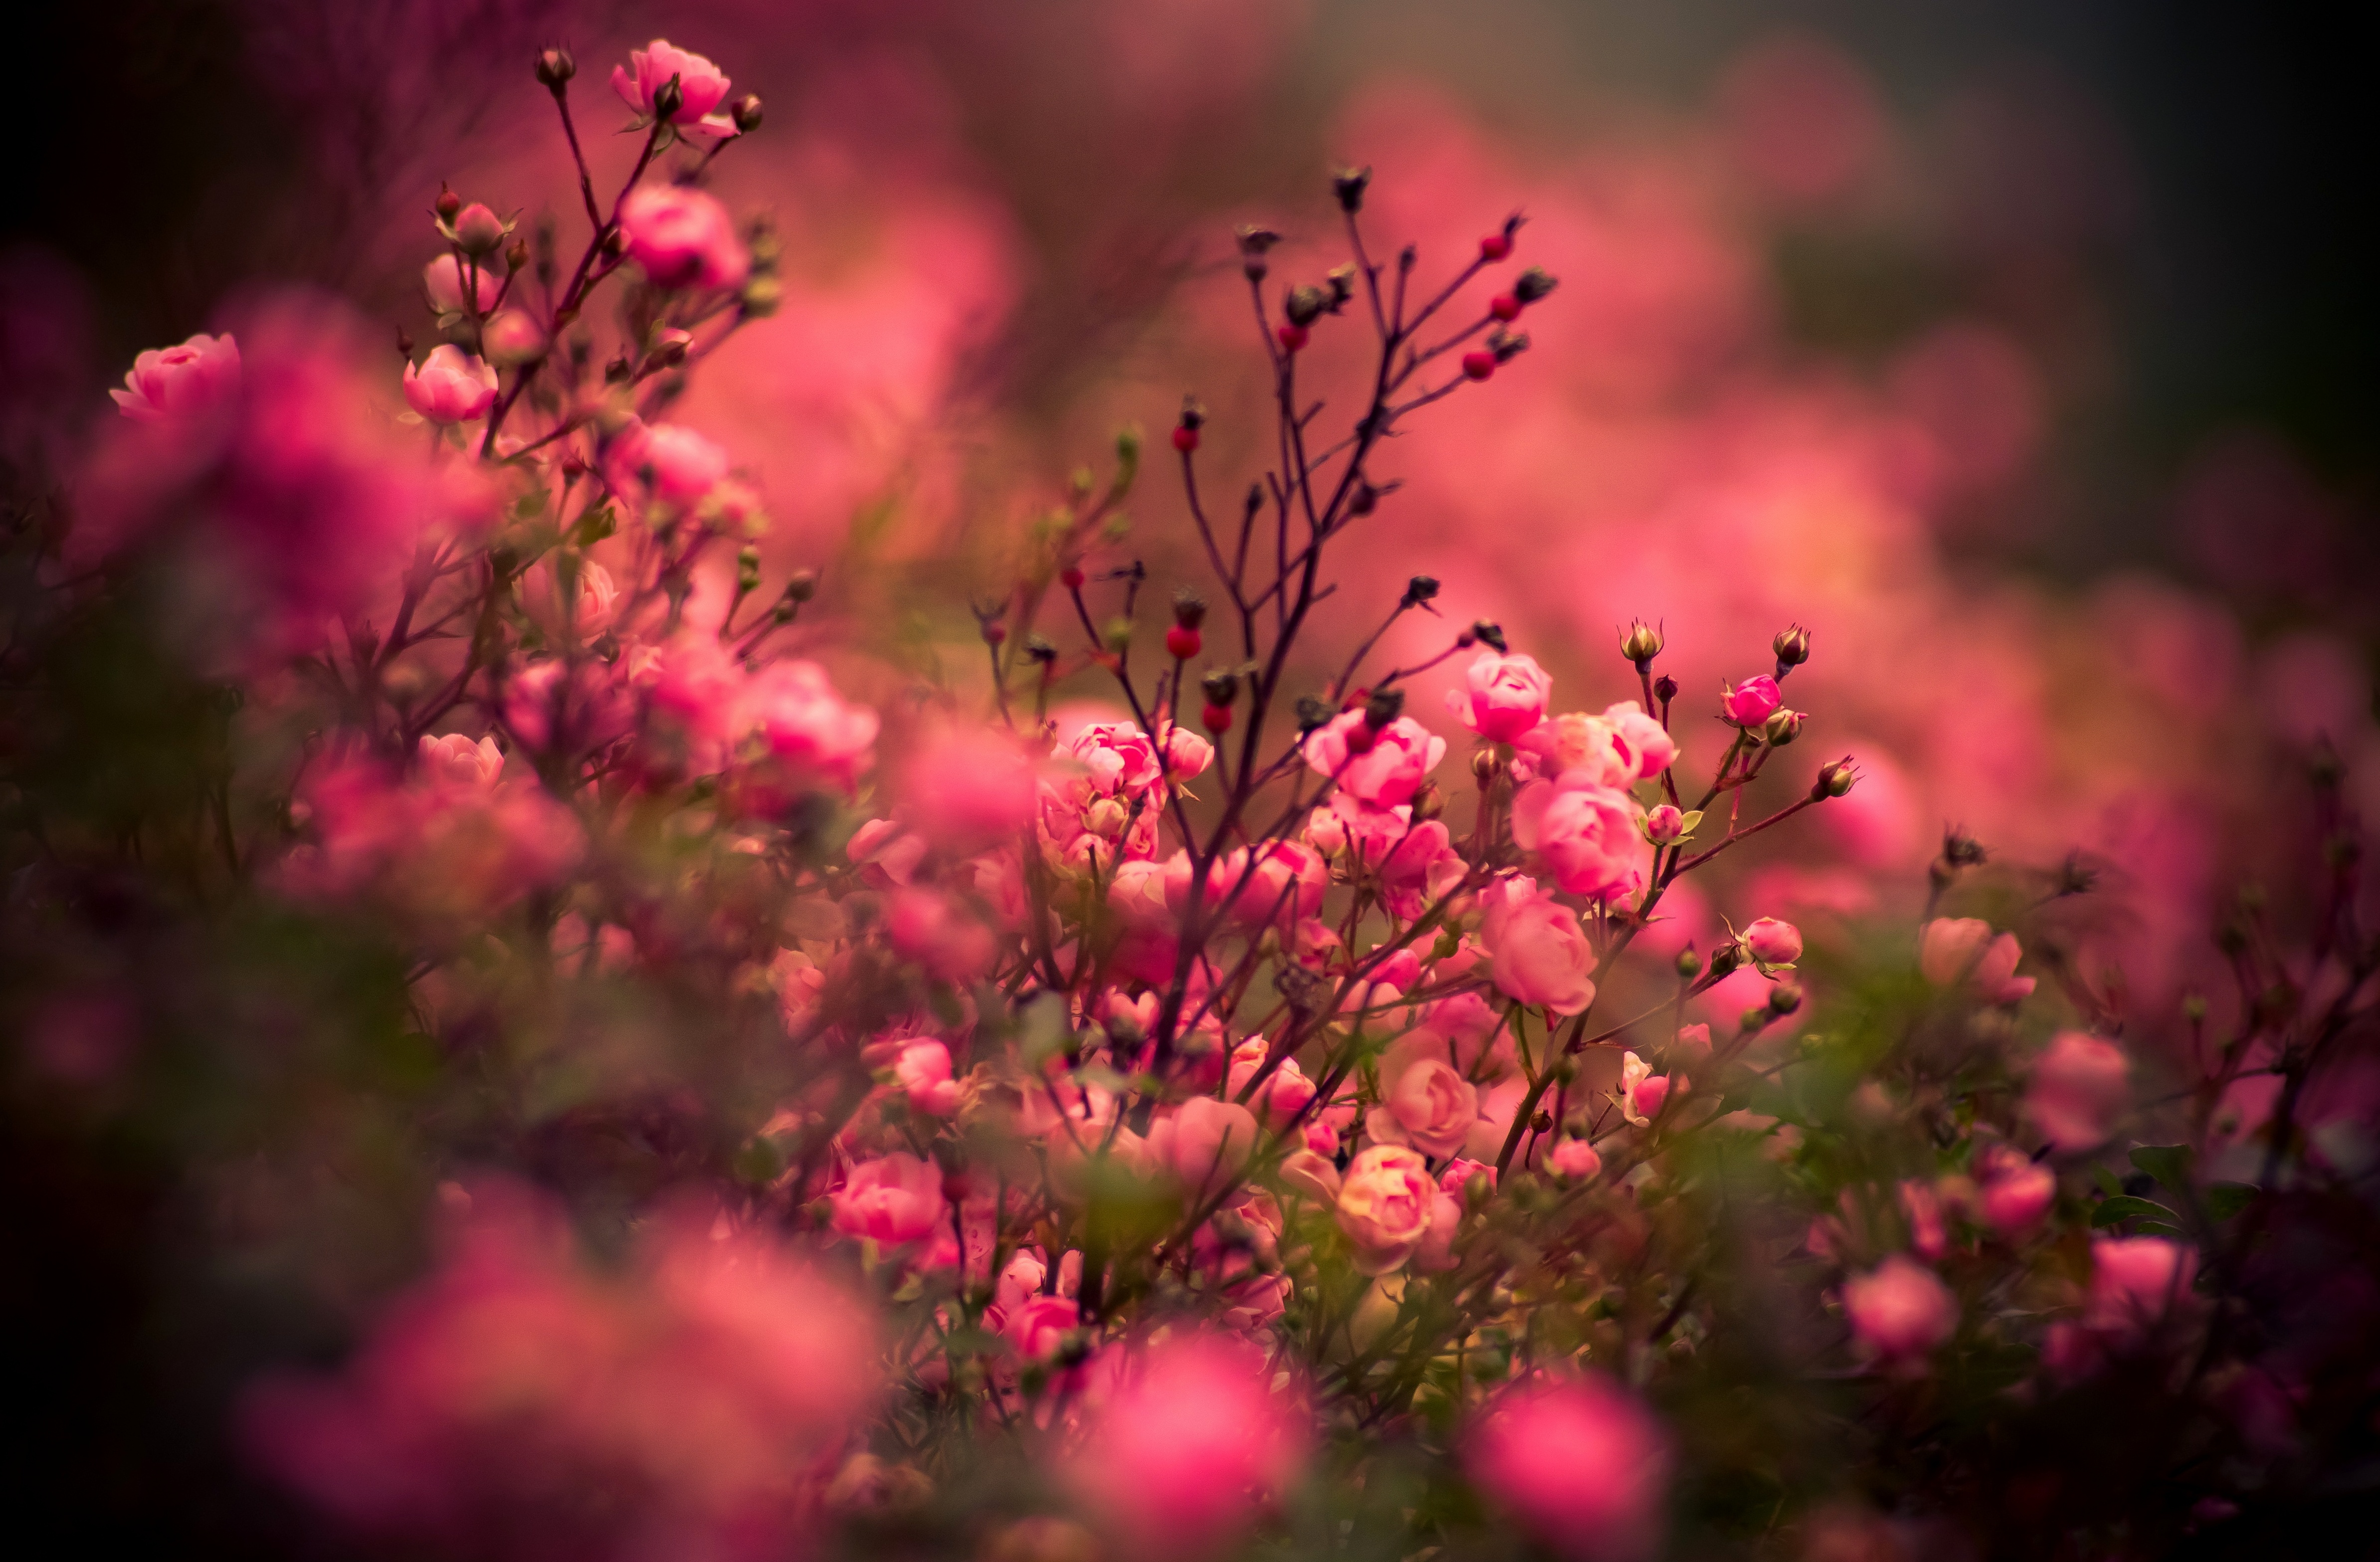 цветы картинки фото: